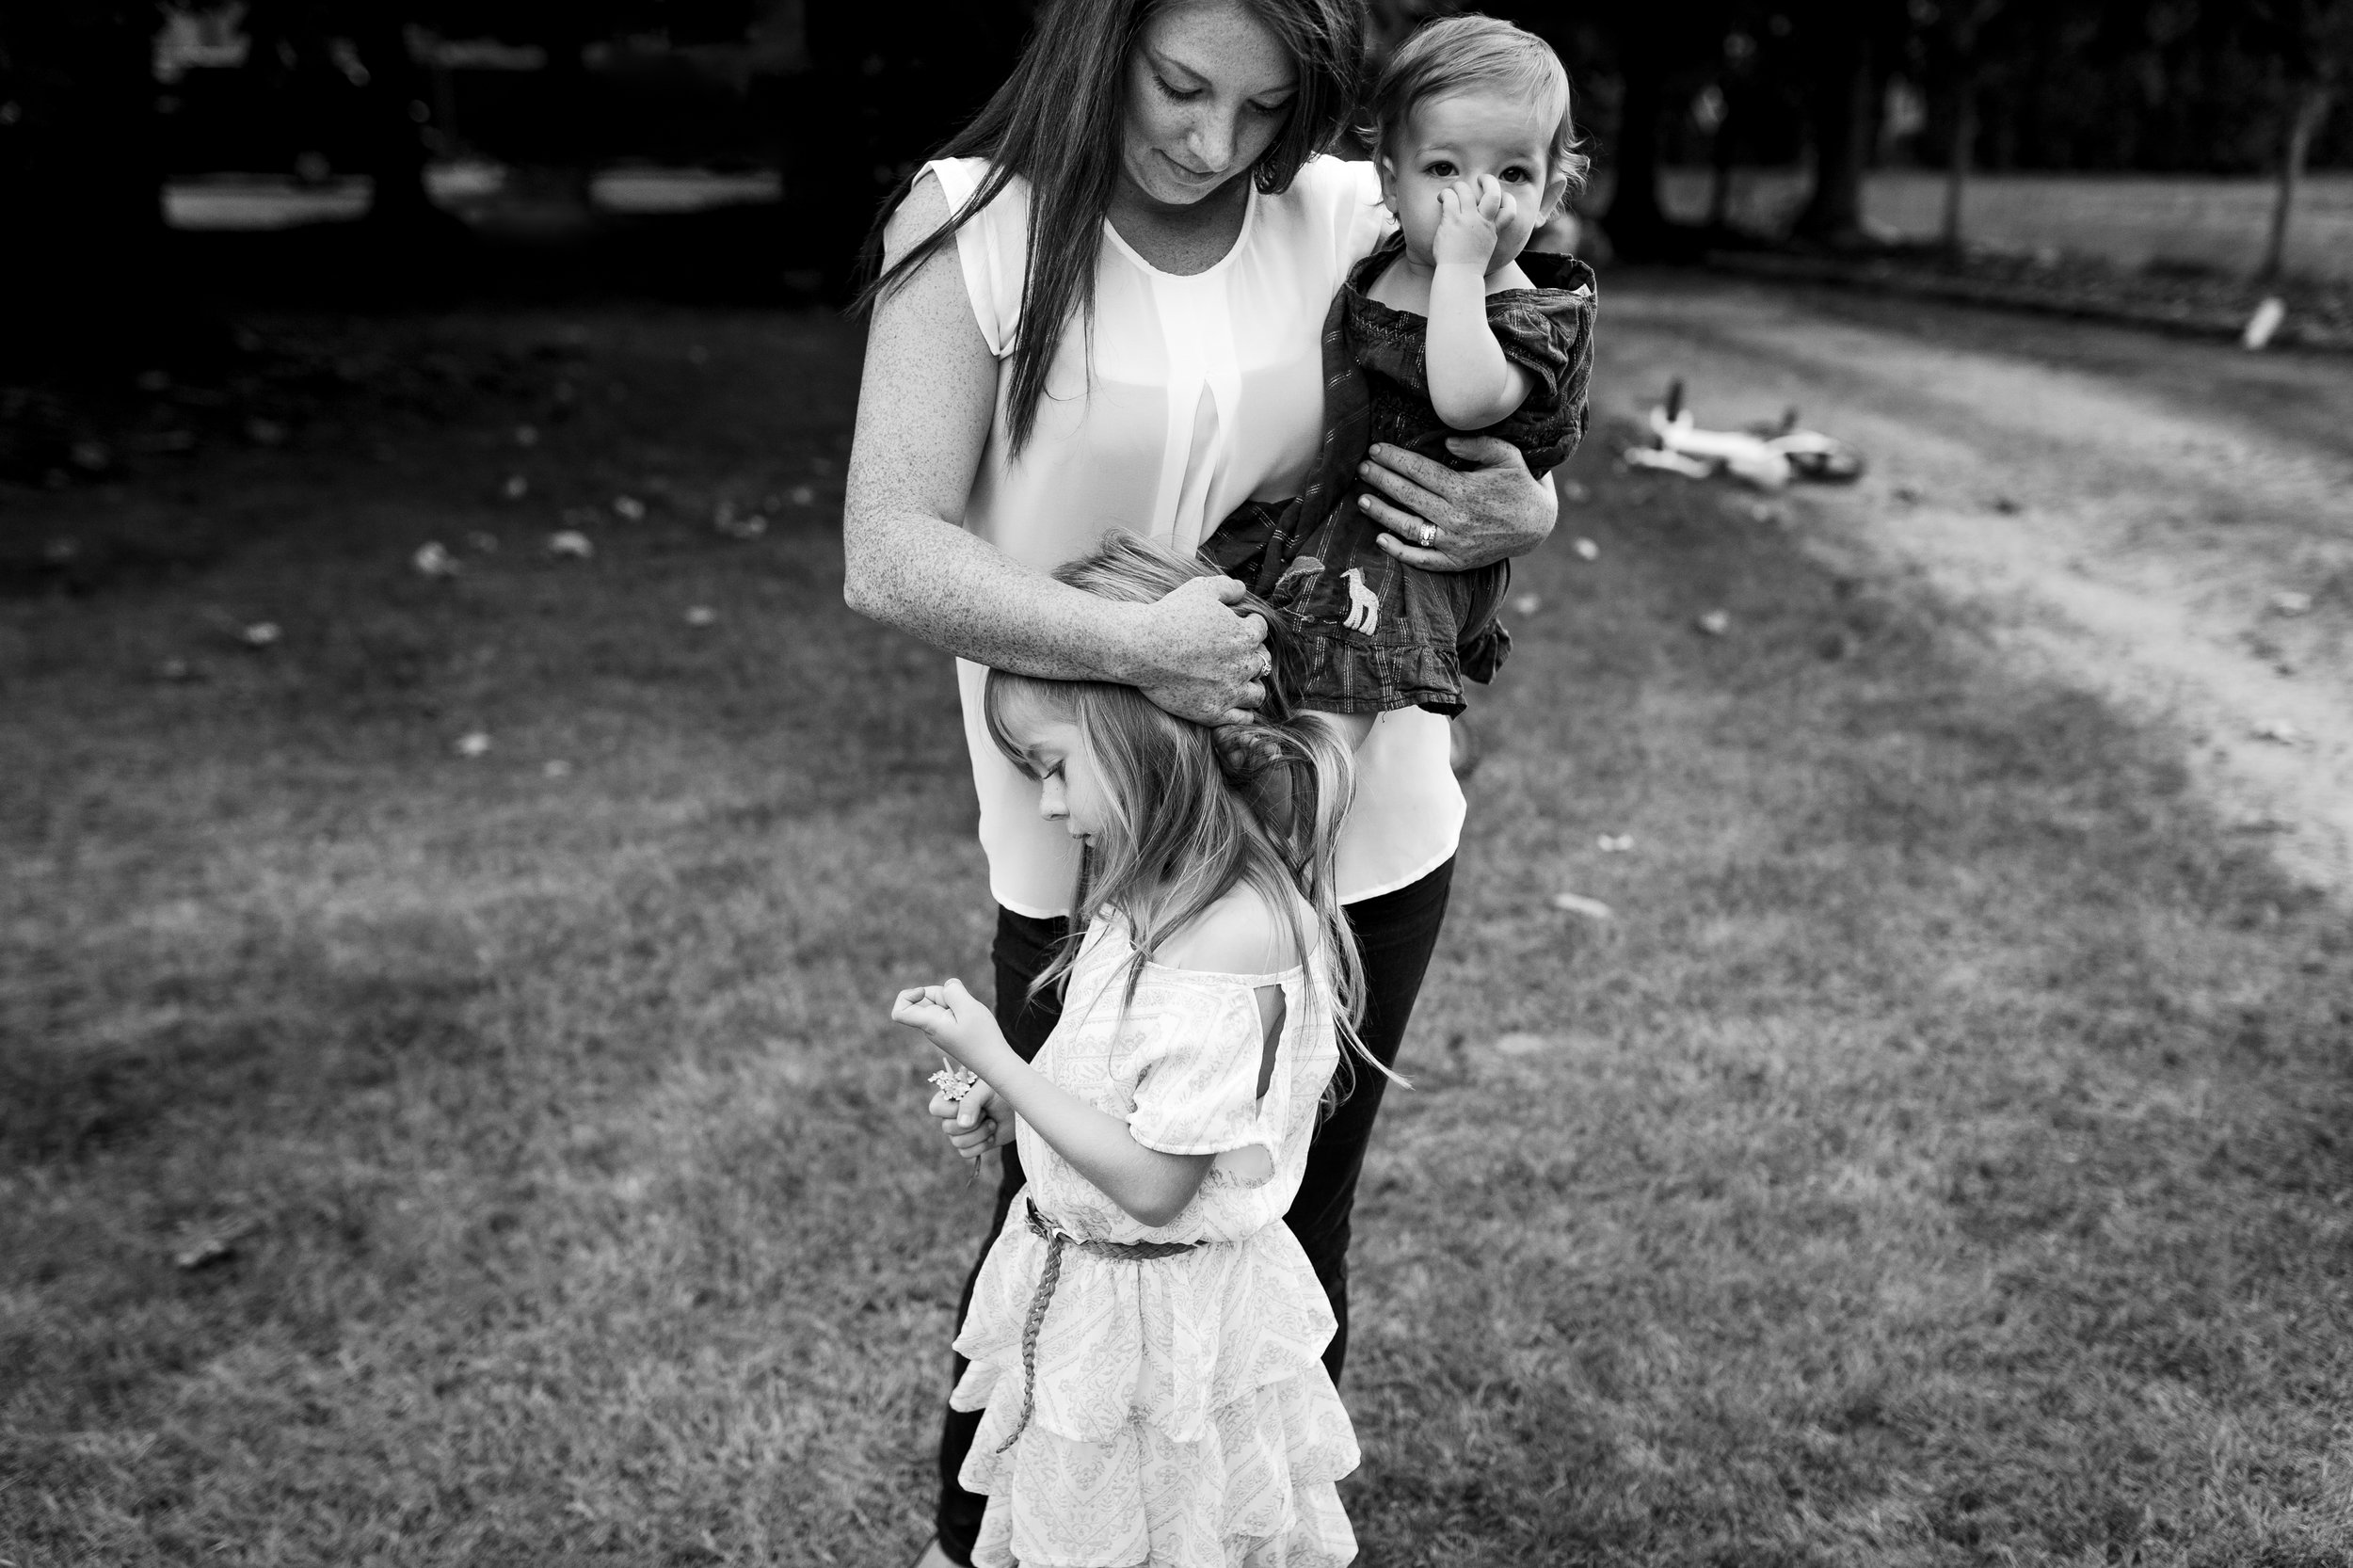 FAMILY FILMS - Documentary Style Family Films